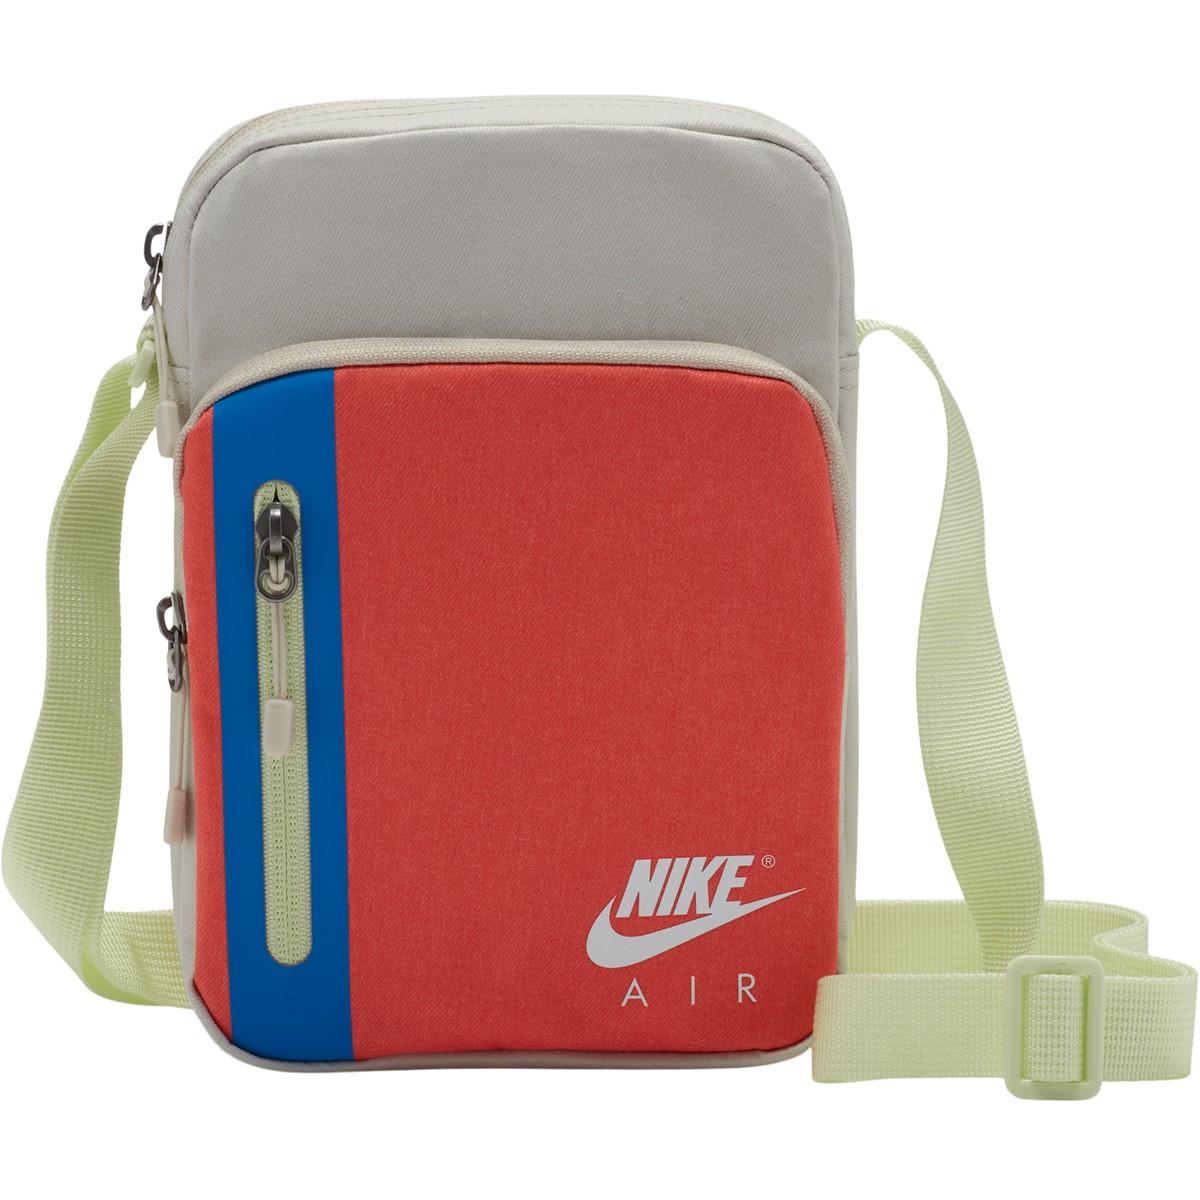 Tech Crossbody Bag in White/Red/Blue